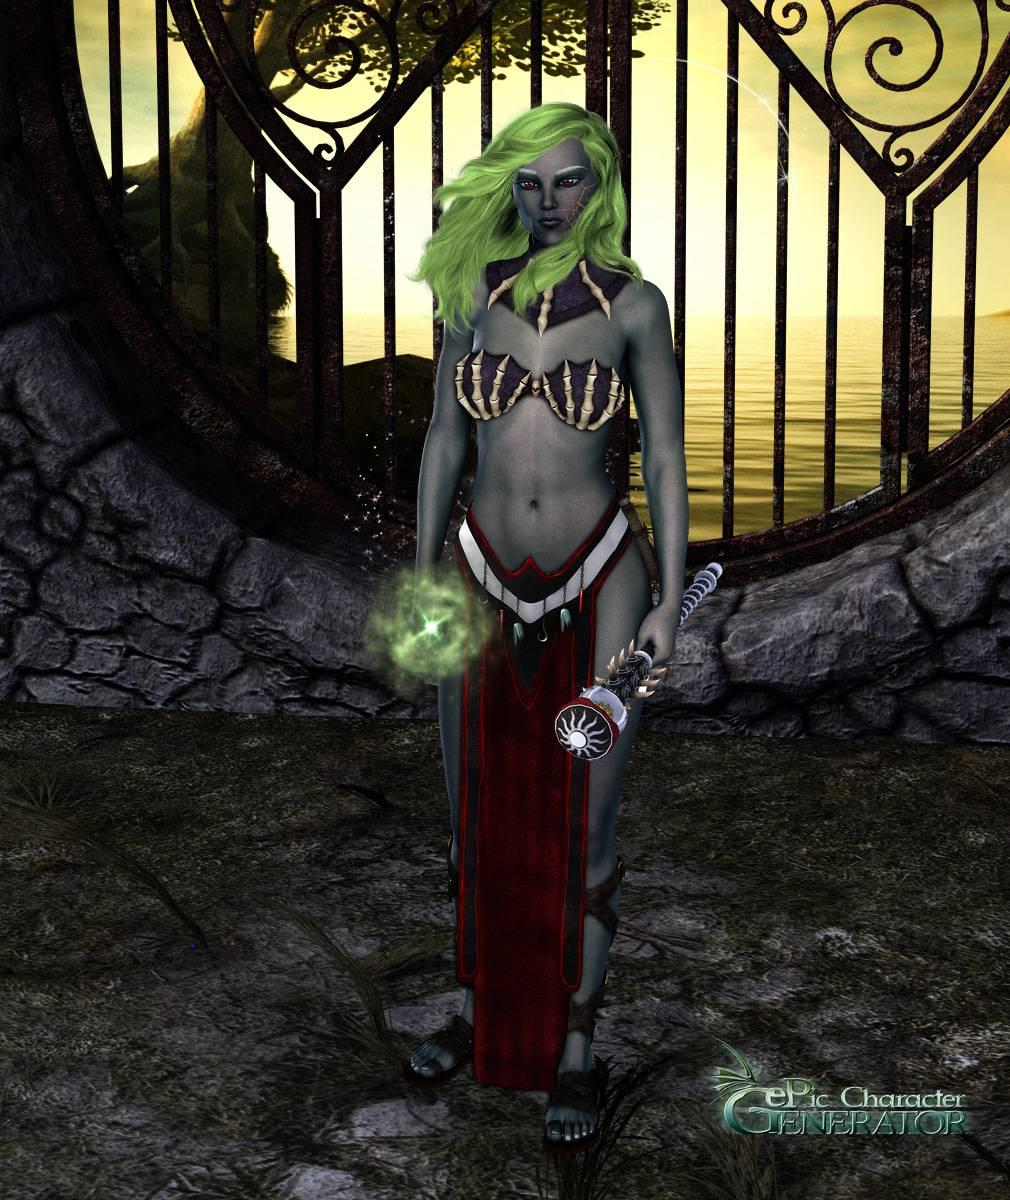 ePic Character Generator Season 2 Female Drow Spellcaster Screenshot 11